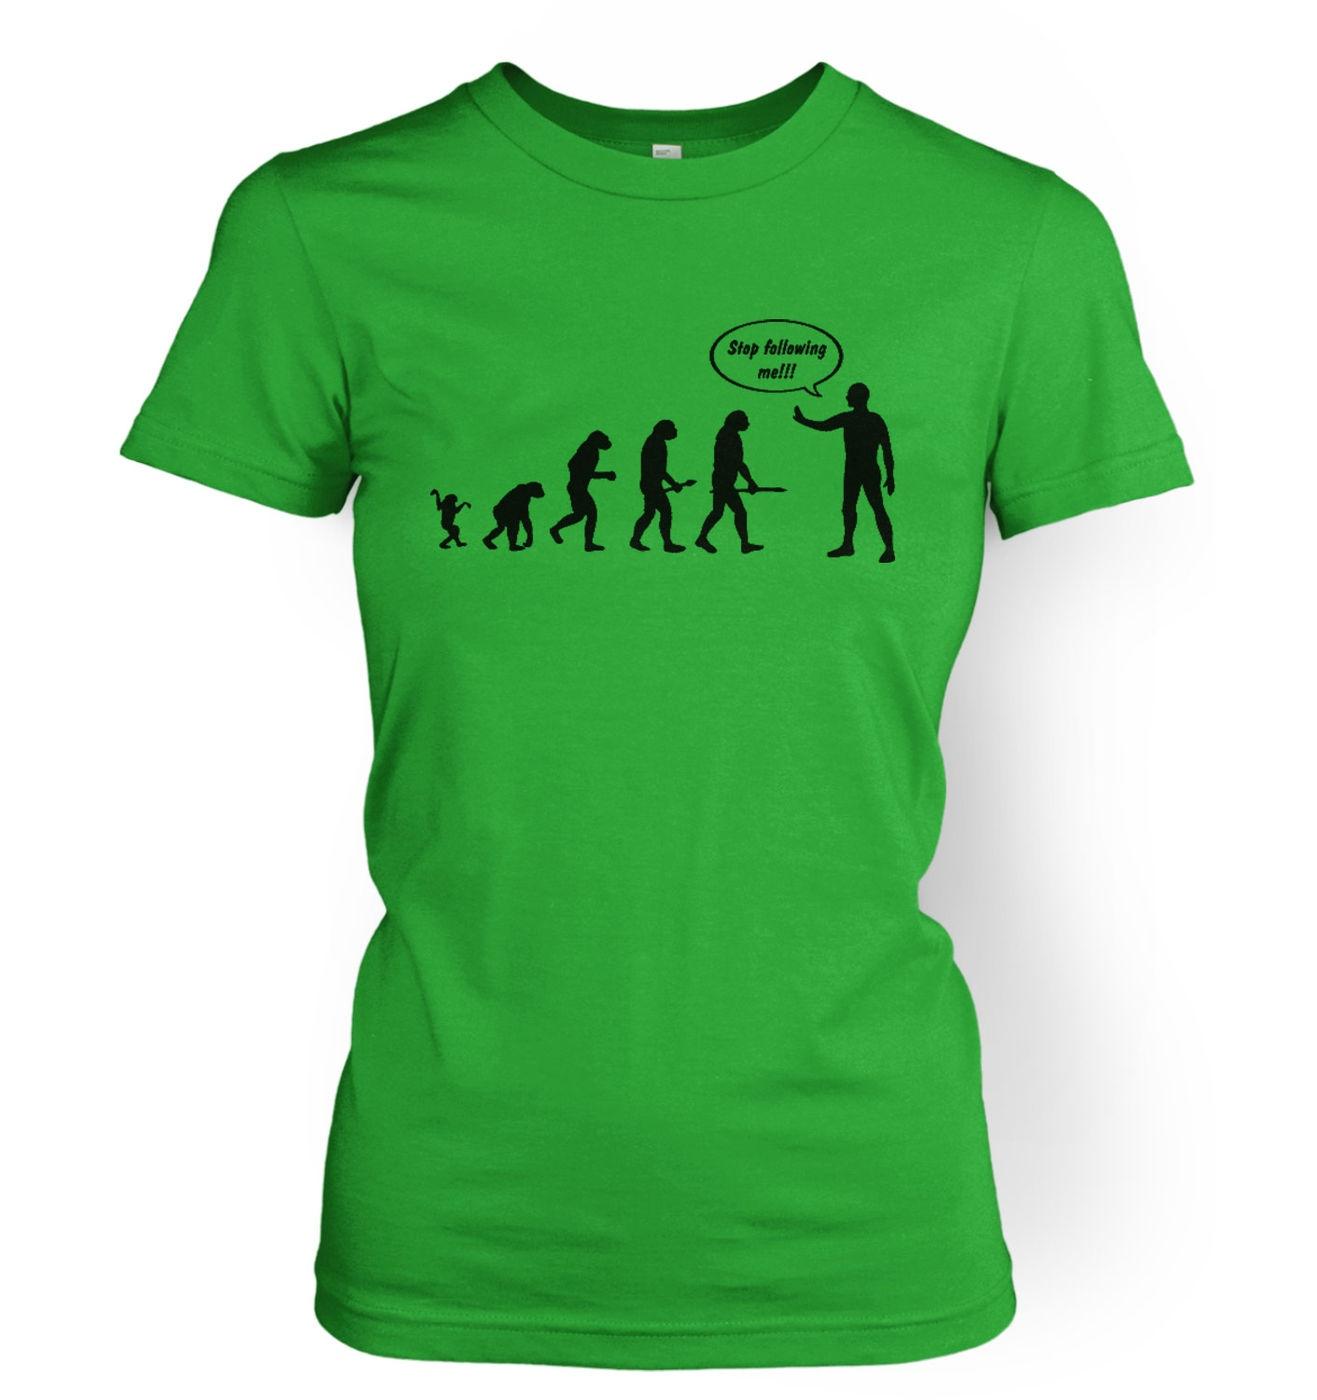 Stop Following Me! Evolution women's t-shirt